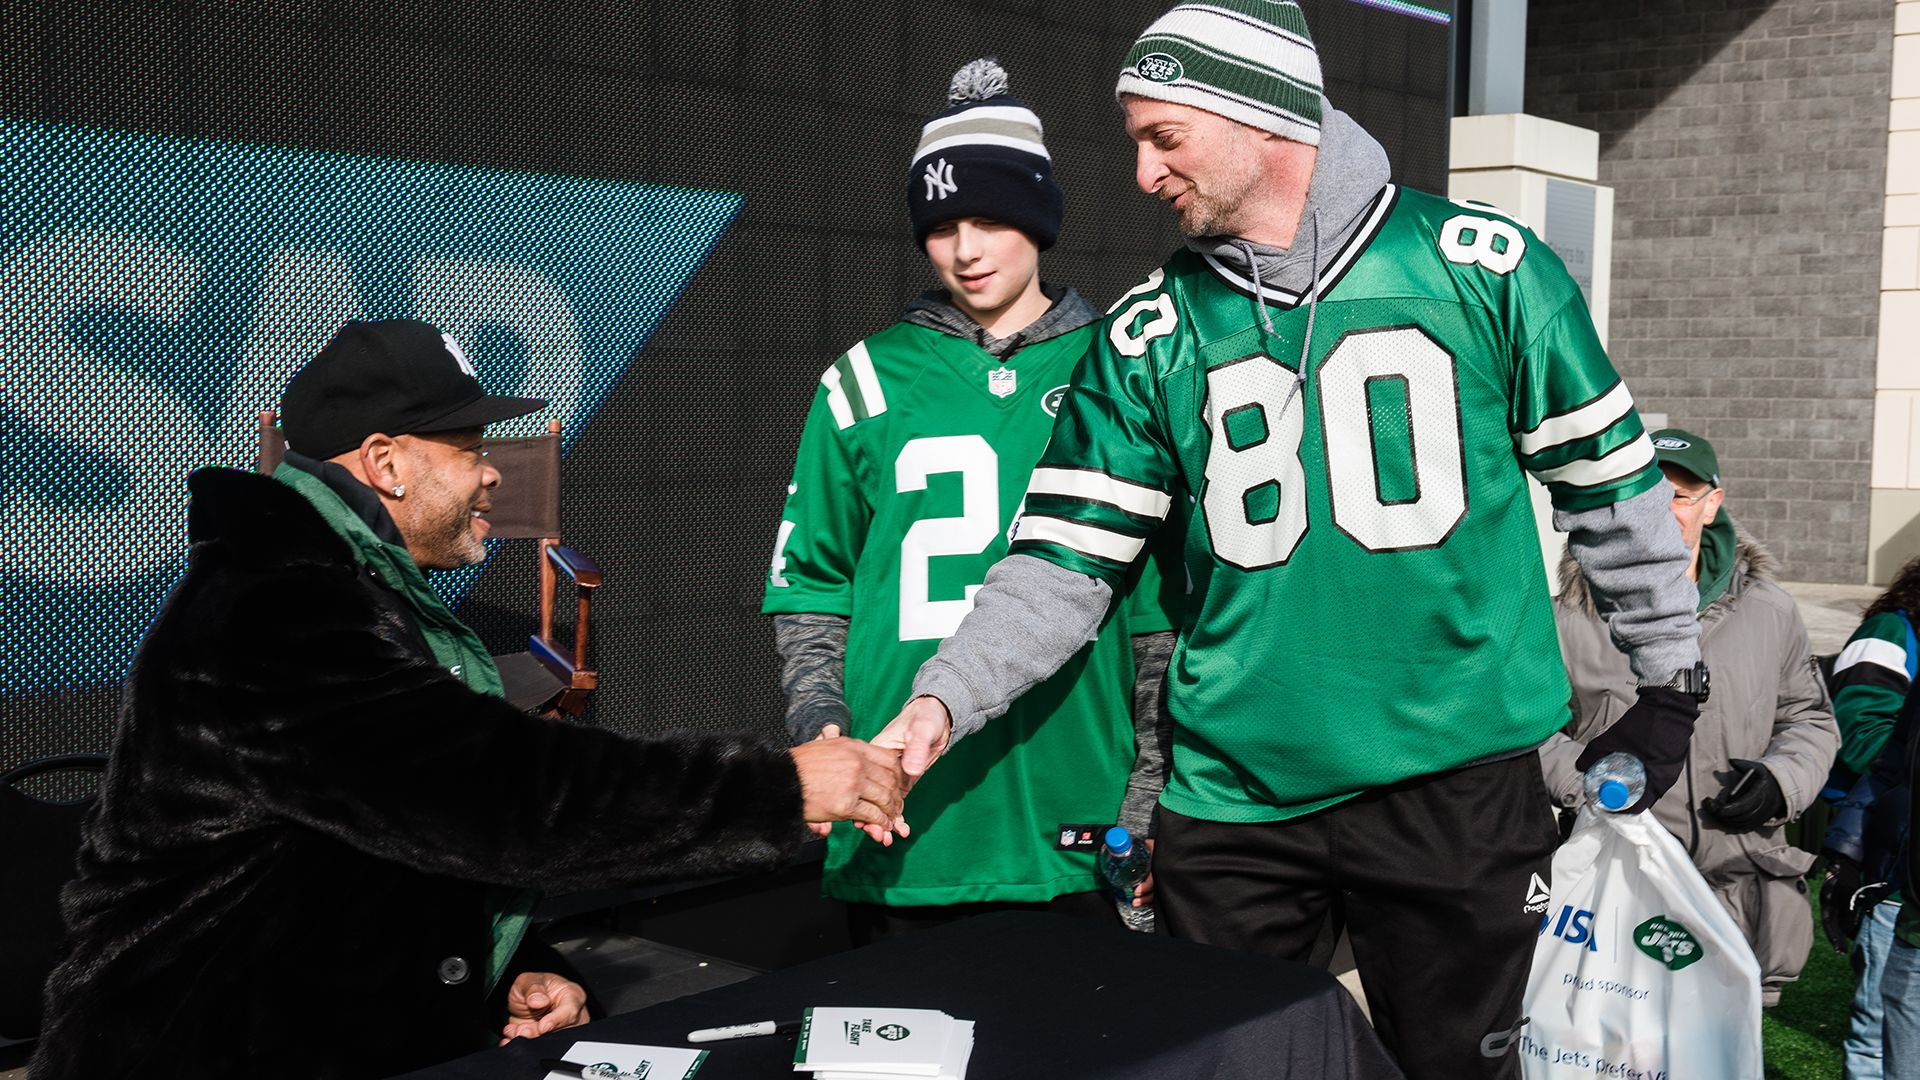 Jets Legends Appearance Schedule